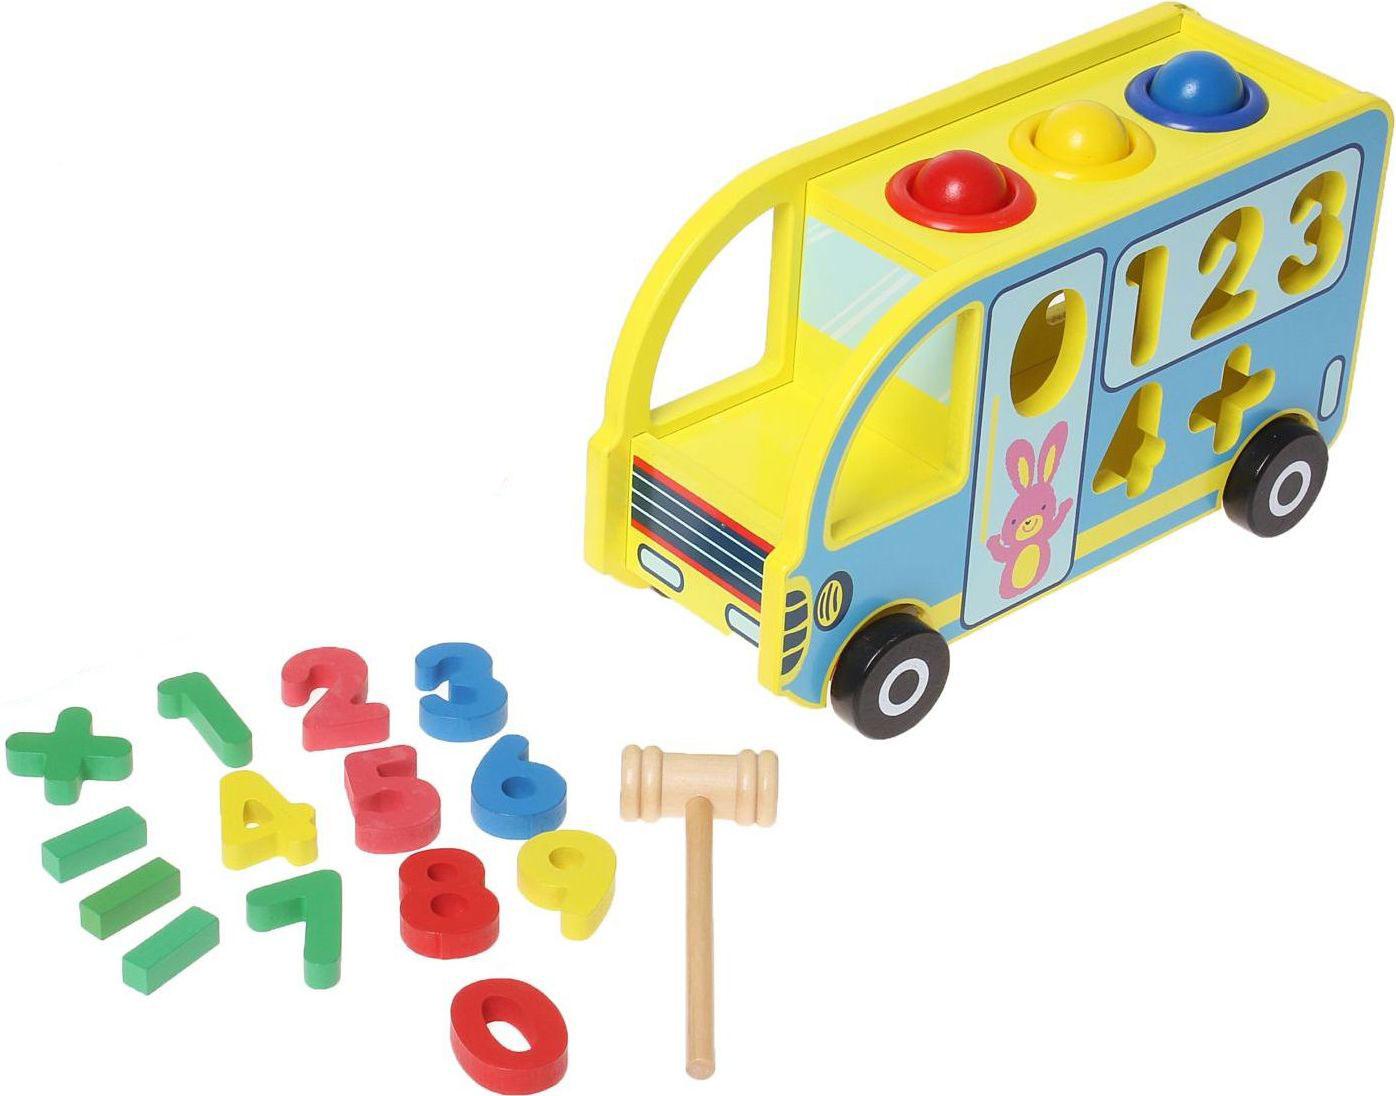 Sima-land Сортер-стучалка Автобус 17 элементов 1158924, Сима-ленд